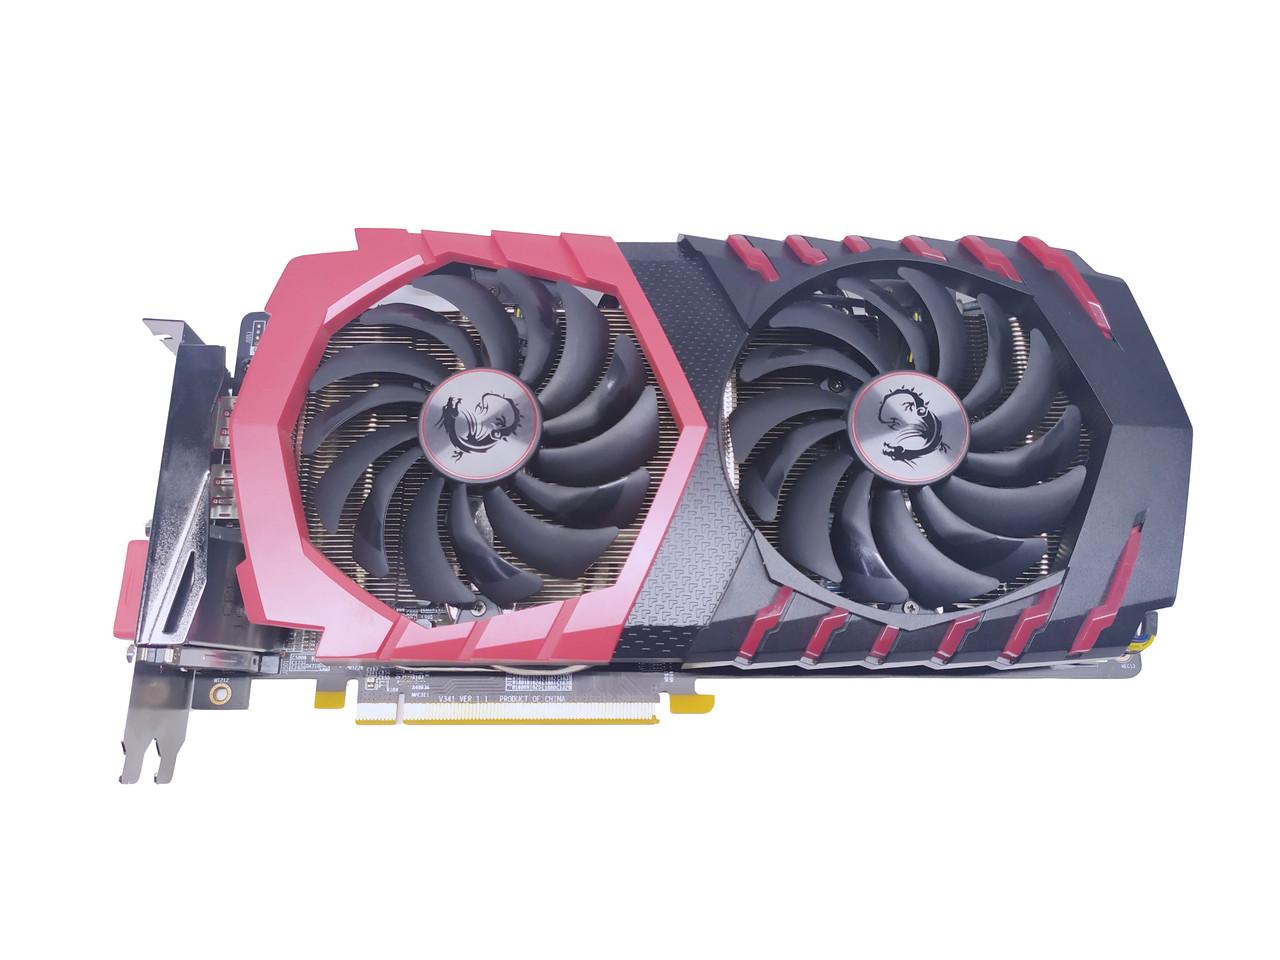 Б/У видеокарта MSI PCI-Ex Radeon RX 470 Gaming 4GB GDDR5 (256bit)(DVI, 2 x HDMI, 2 x DisplayPort)